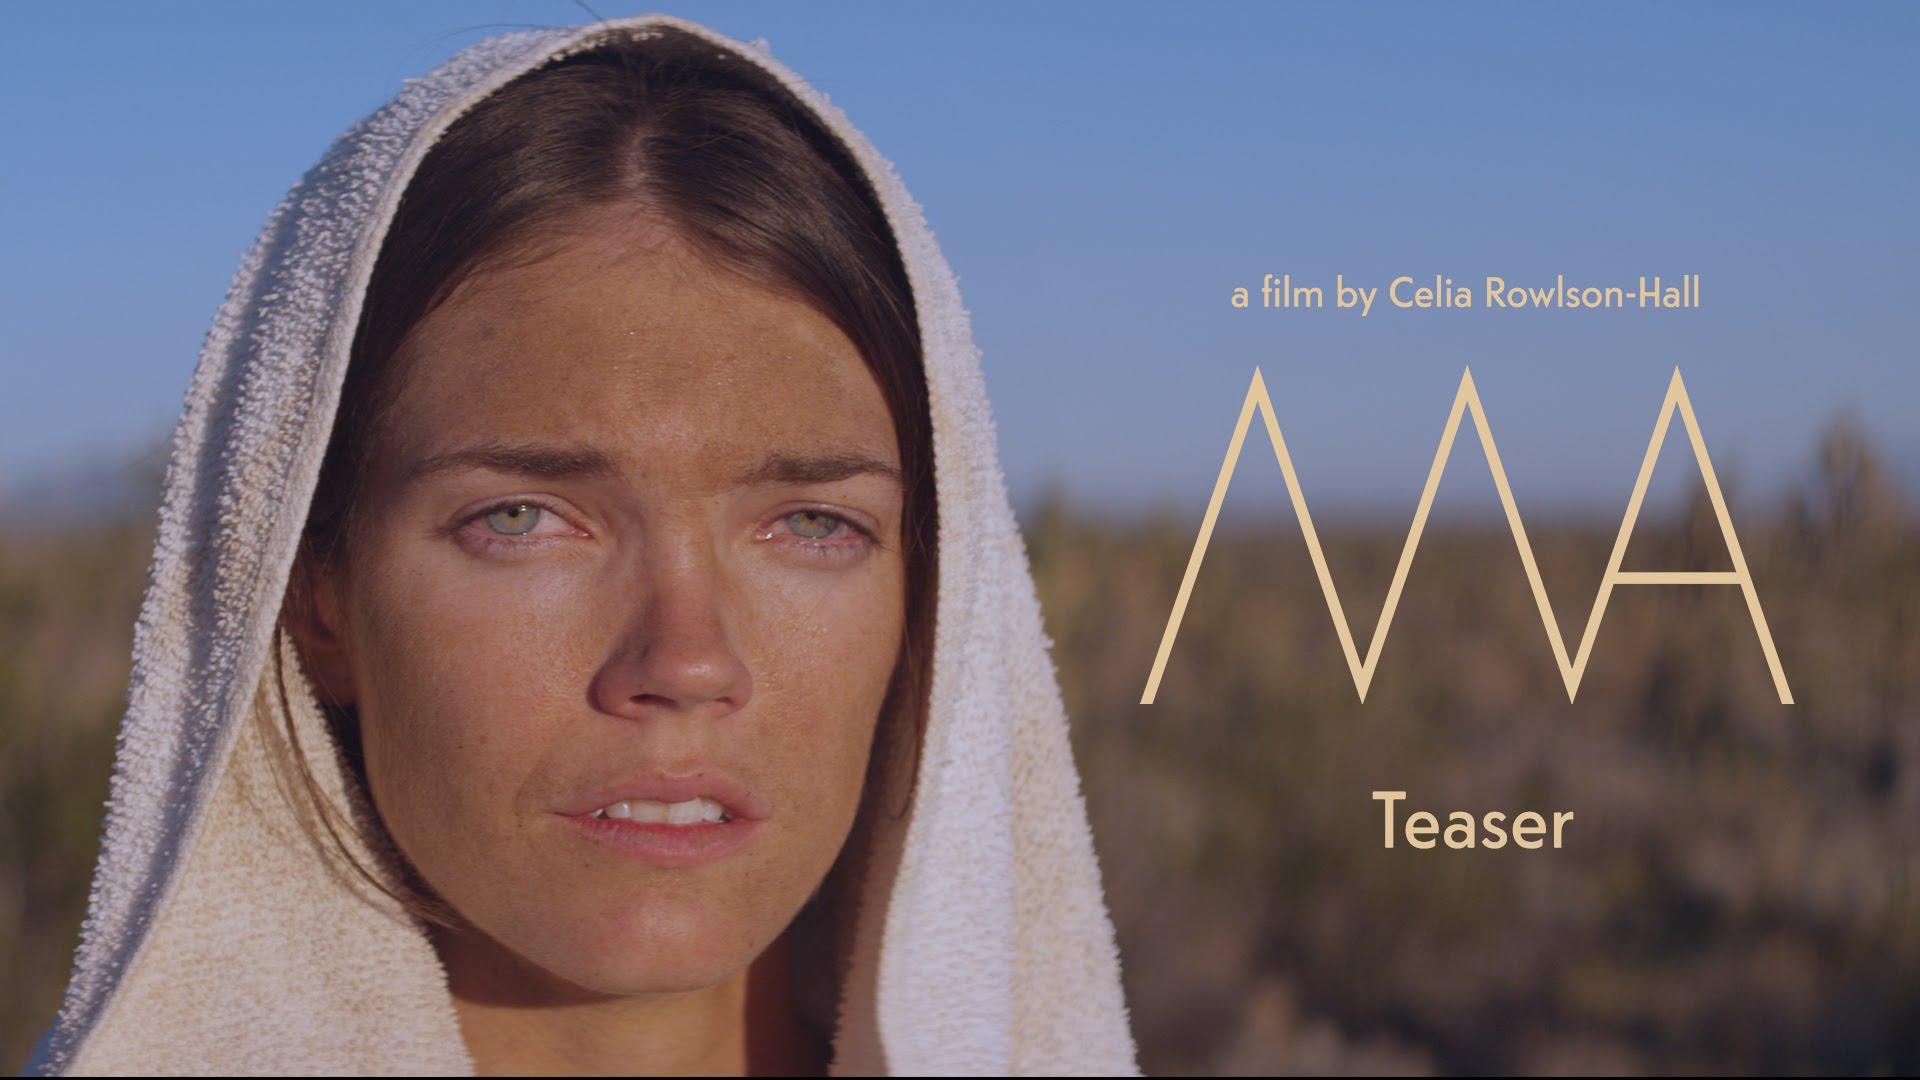 MA - A Film by Celia Rowlson-Hall - Teaser